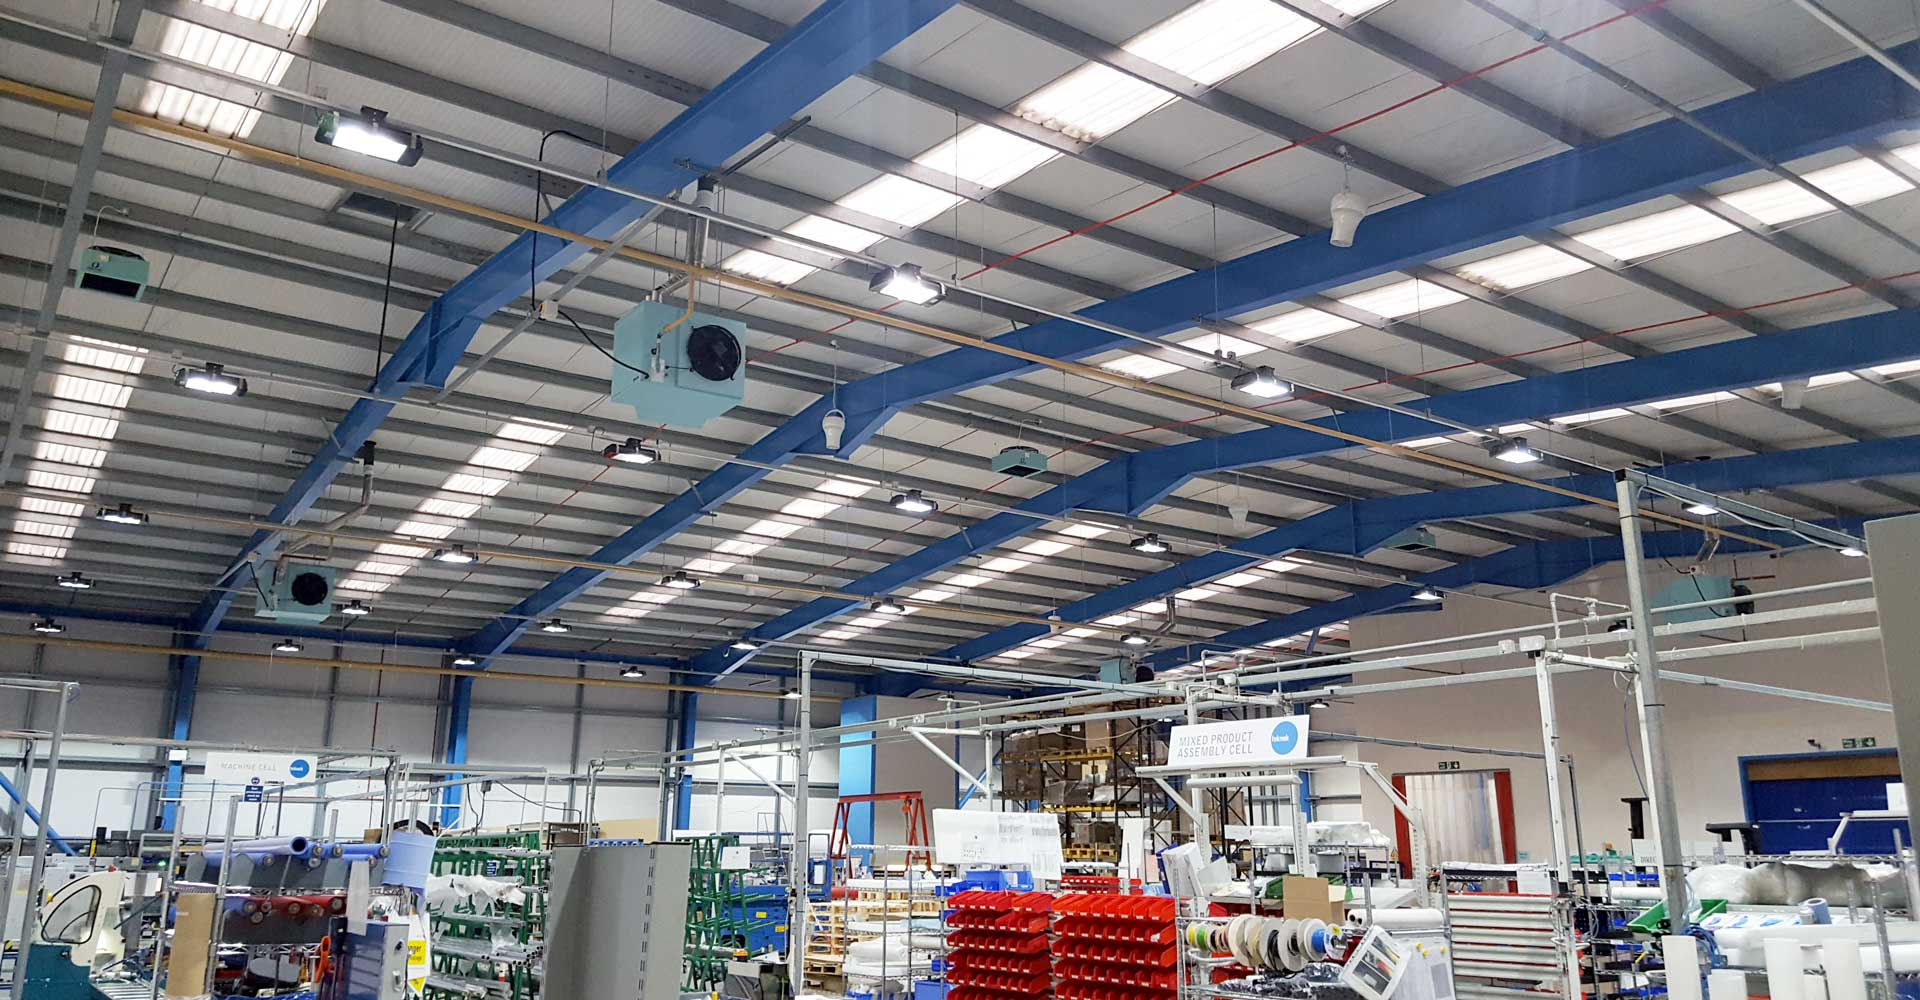 Airius Warehouse Ceiling Fans Keeping Teknek Staff Comfortable